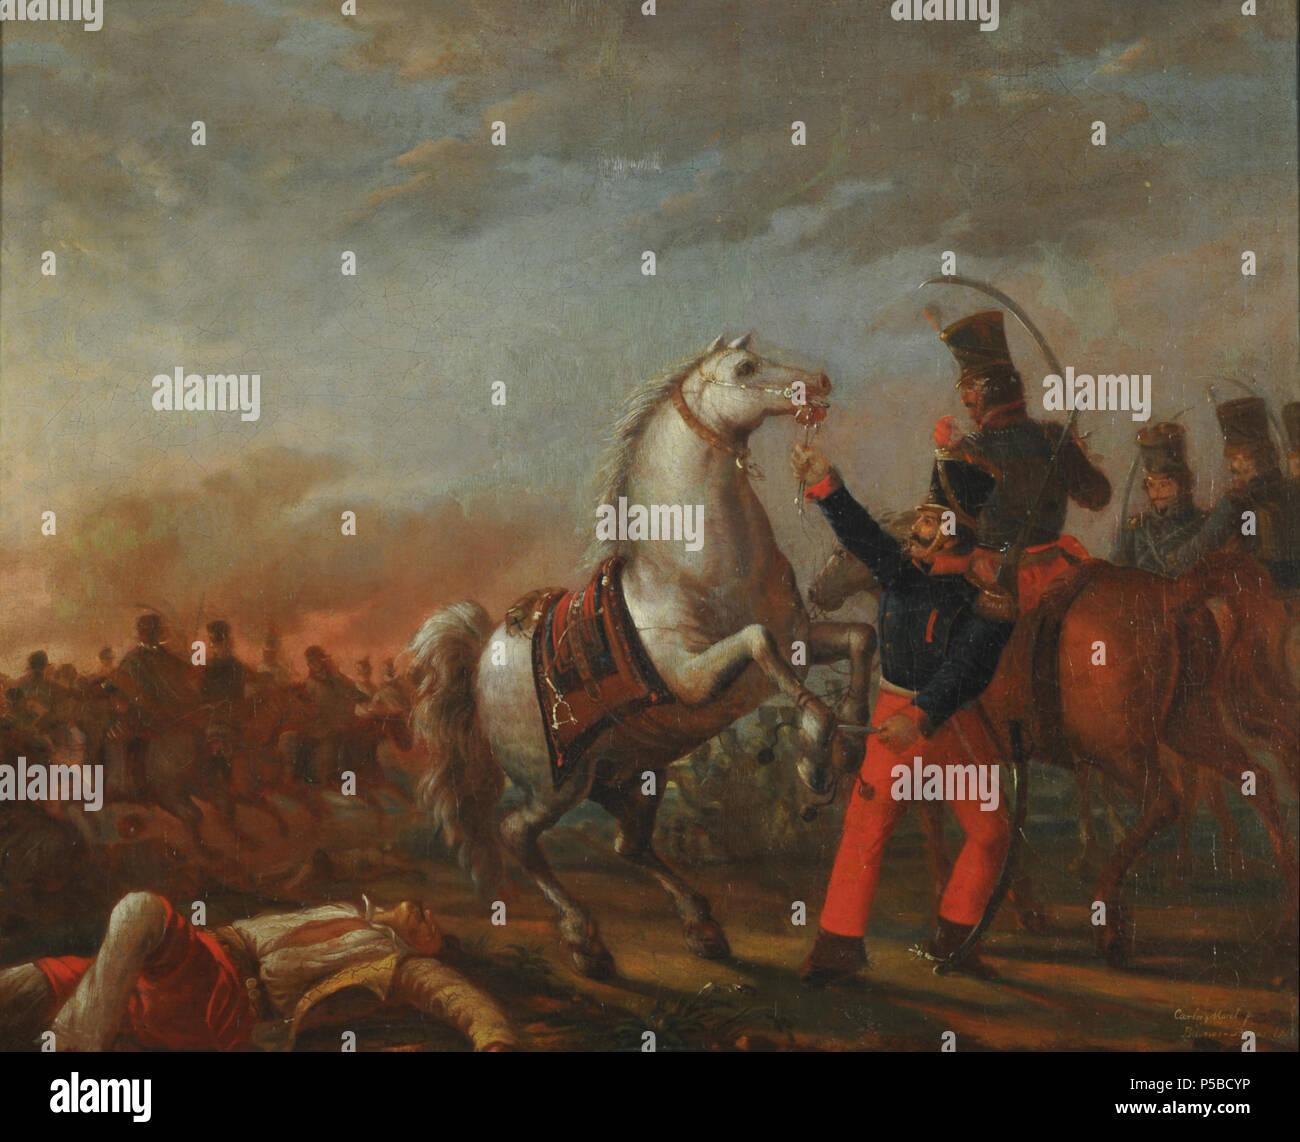 271 Carga de caballería - Carlos Morel - Stock Image